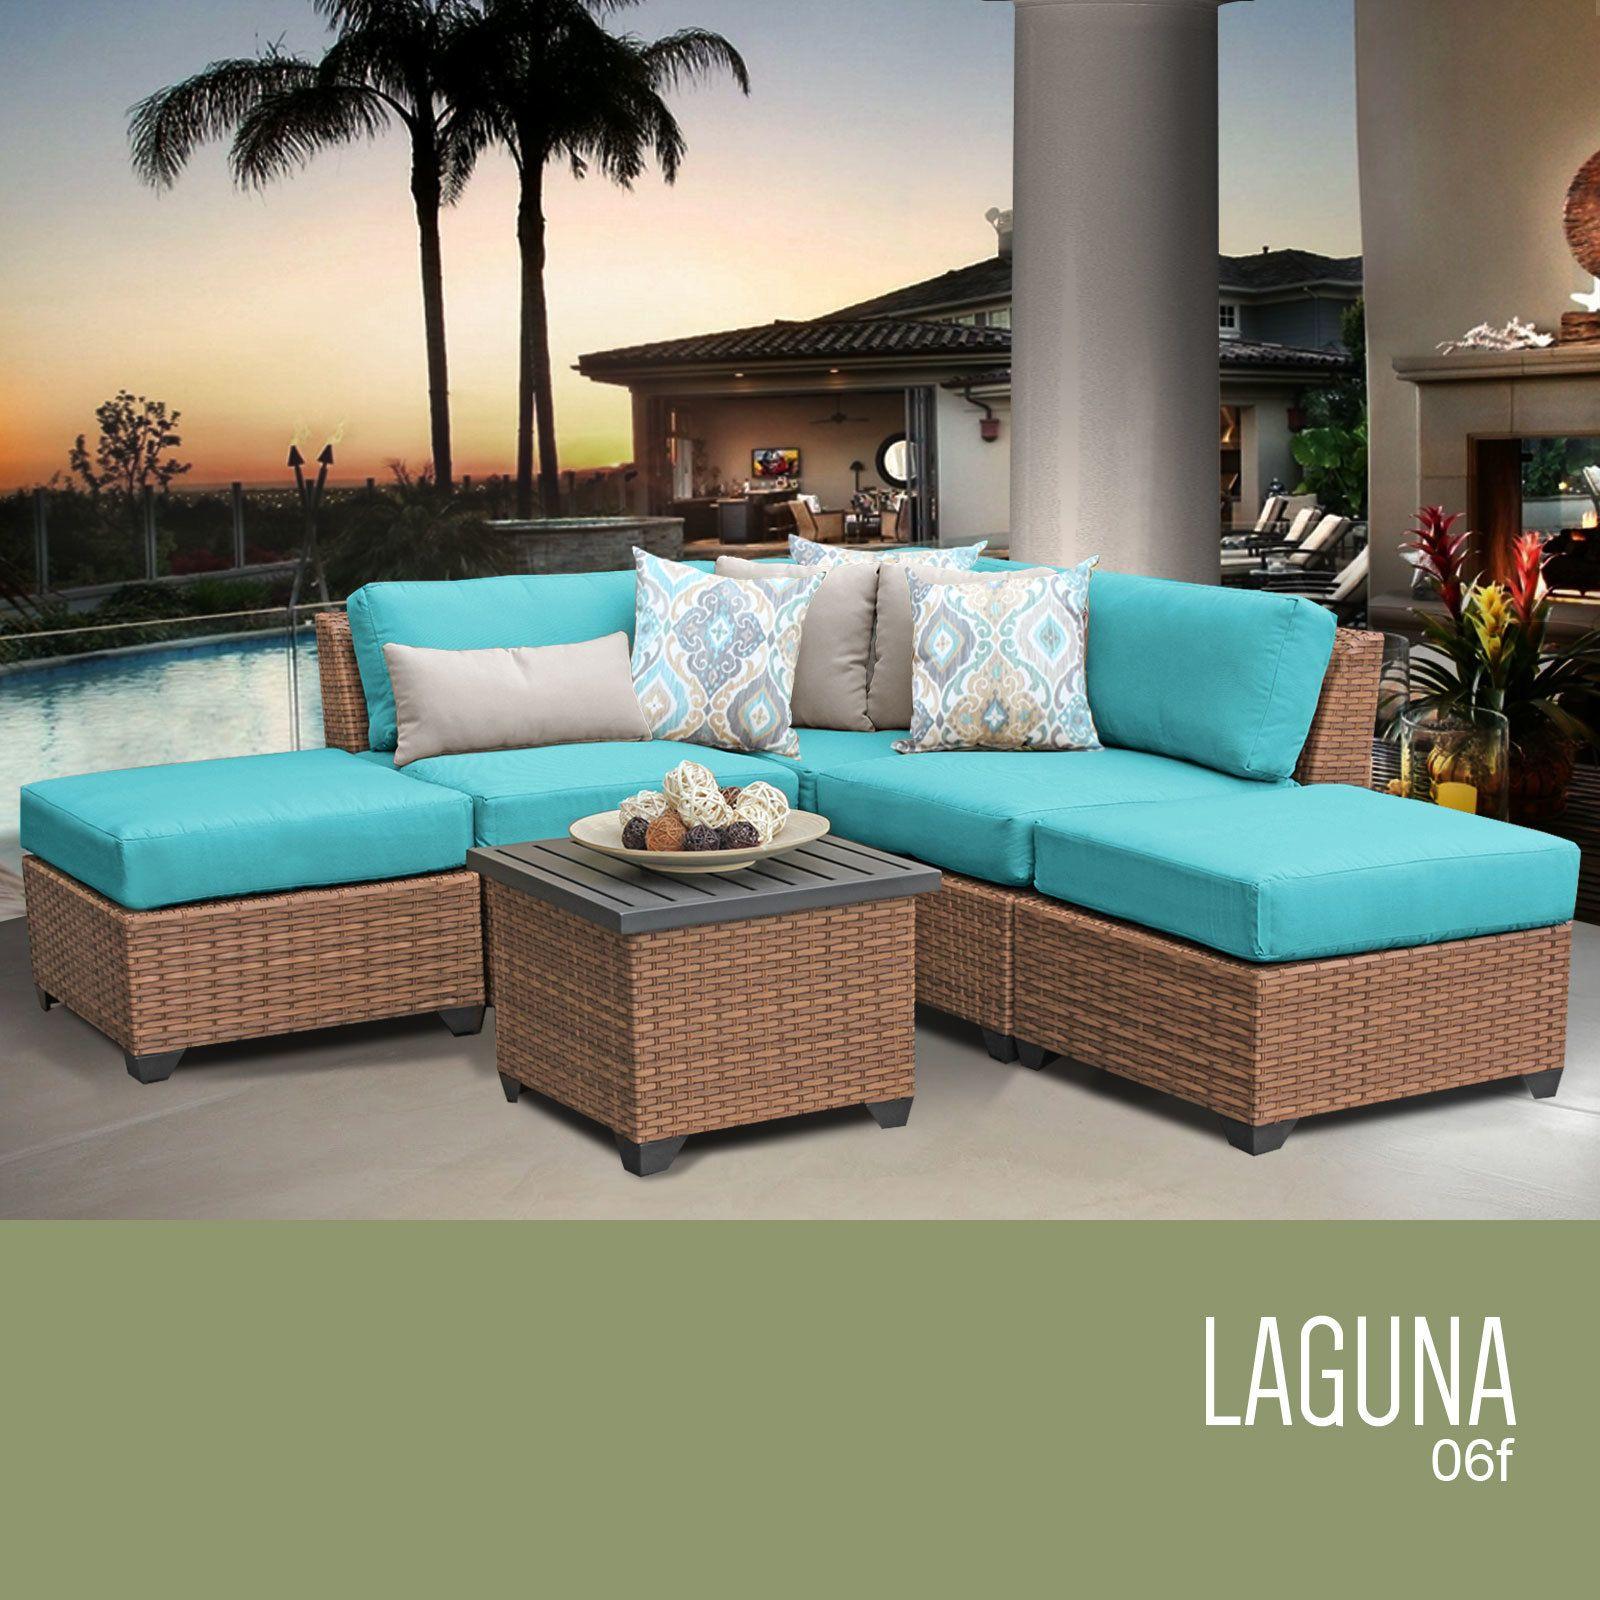 Laguna 6 Piece Outdoor Wicker Patio Furniture Set 06f